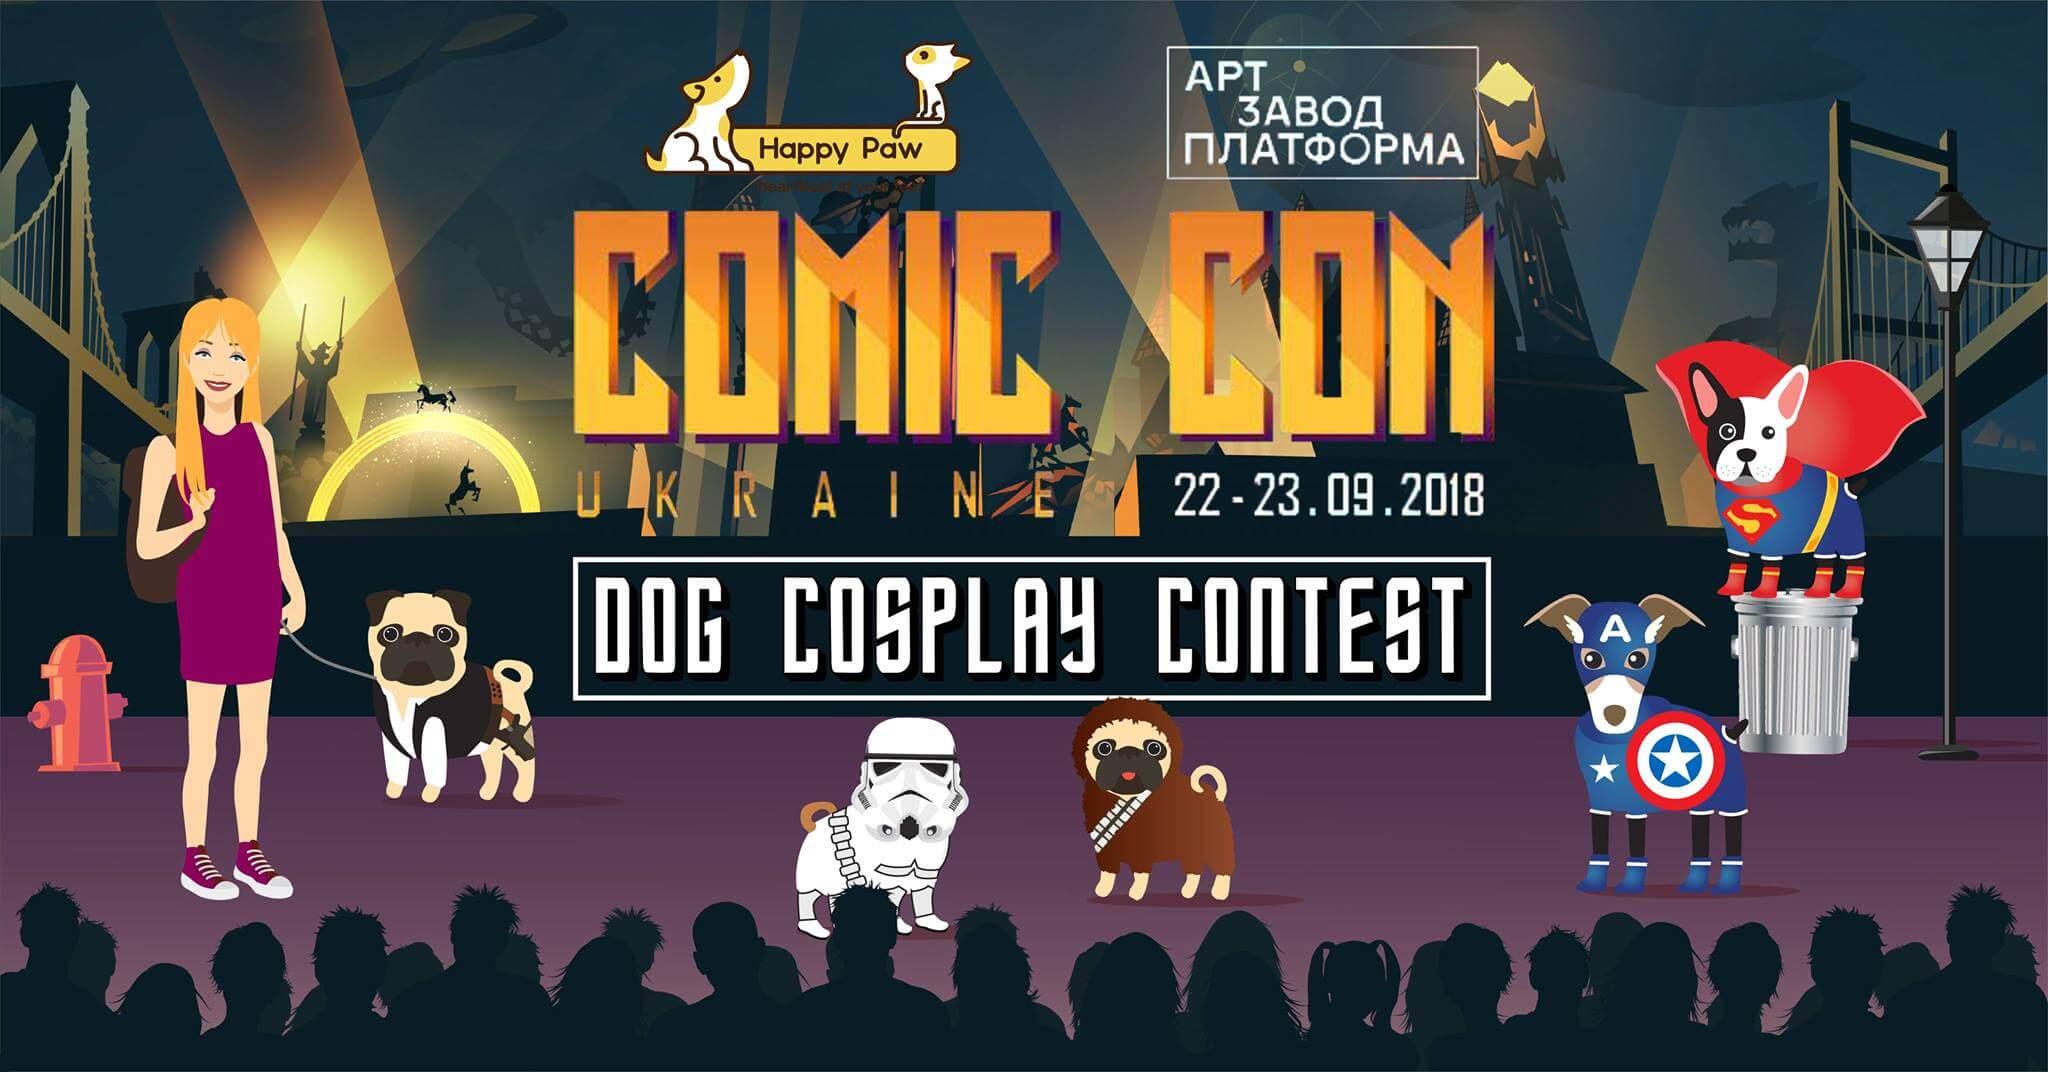 Dog Cosplay Contest